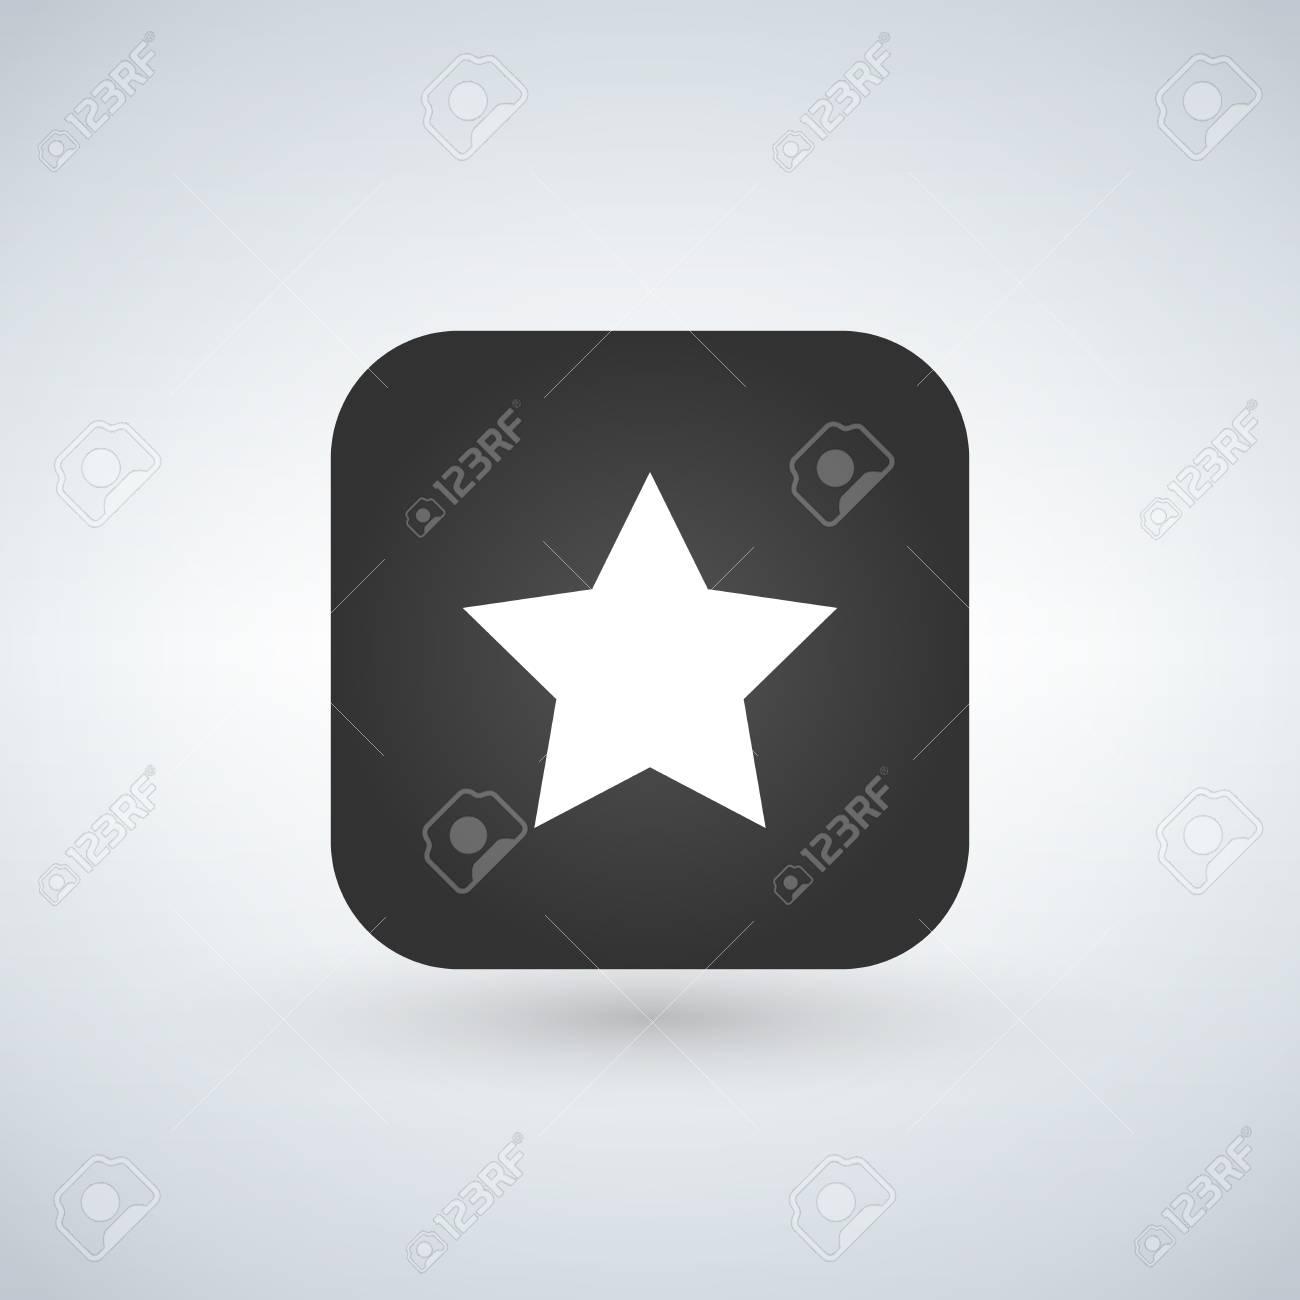 Star sign app